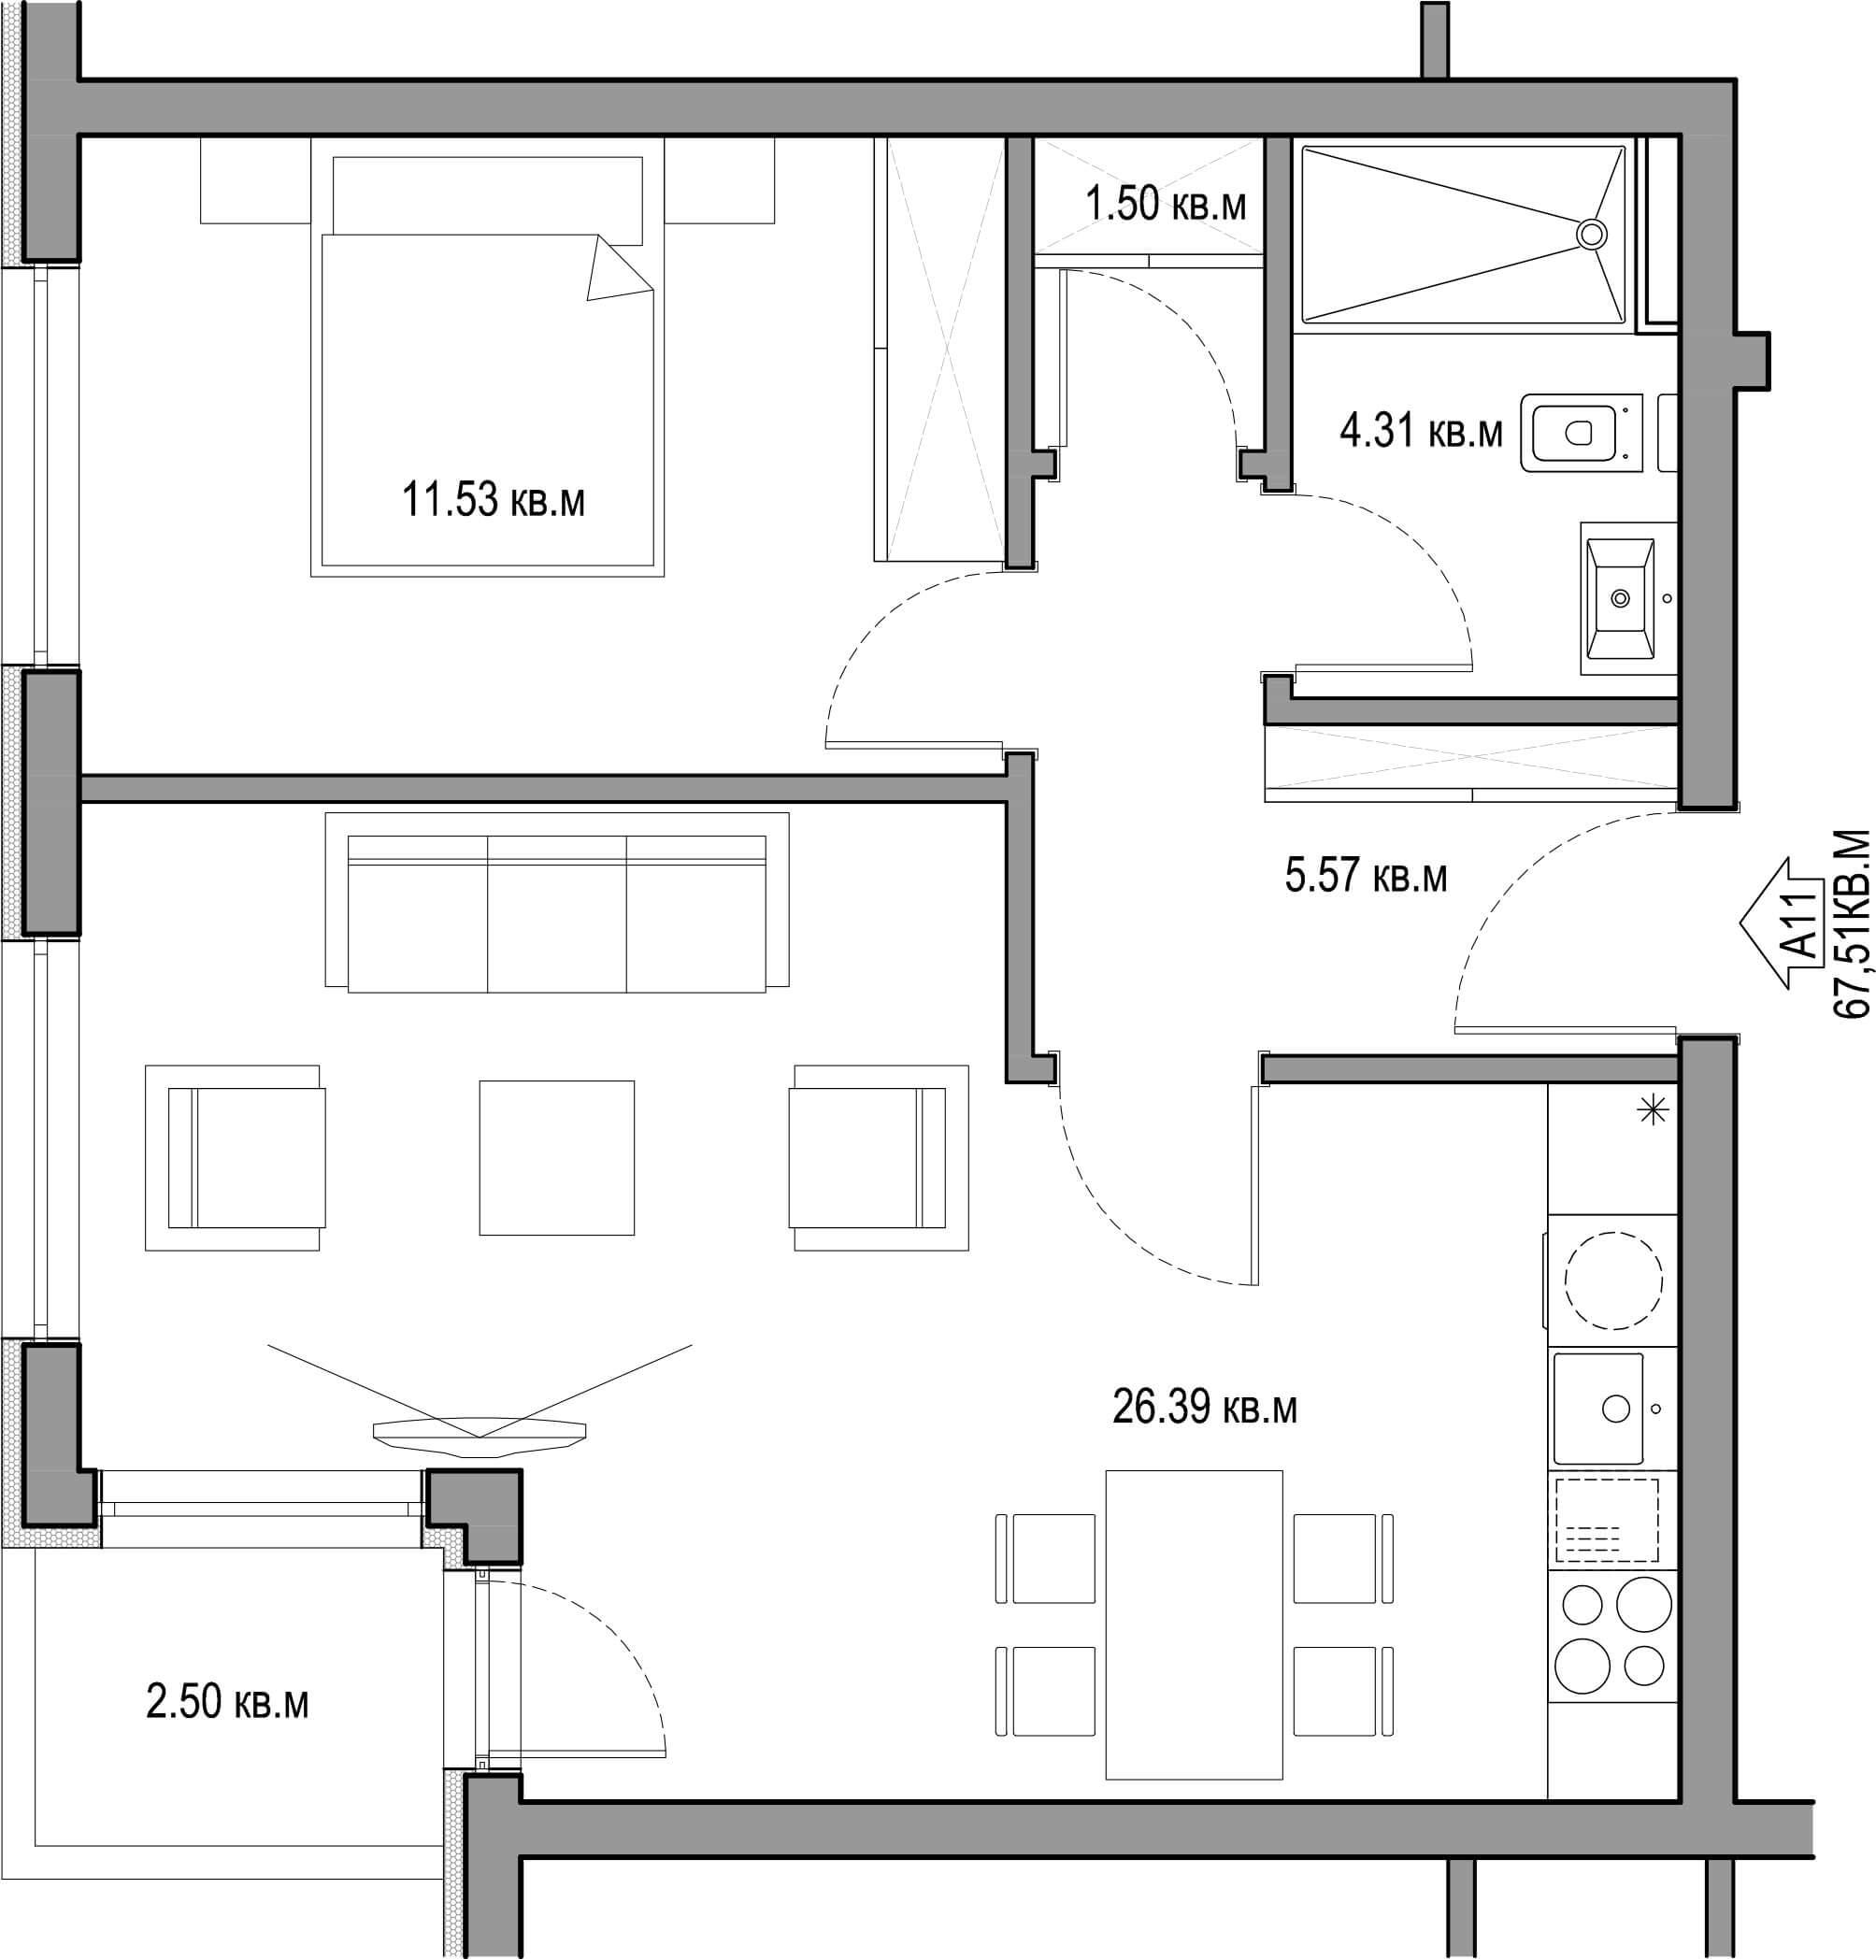 Vinitsa_Apartment_1_11